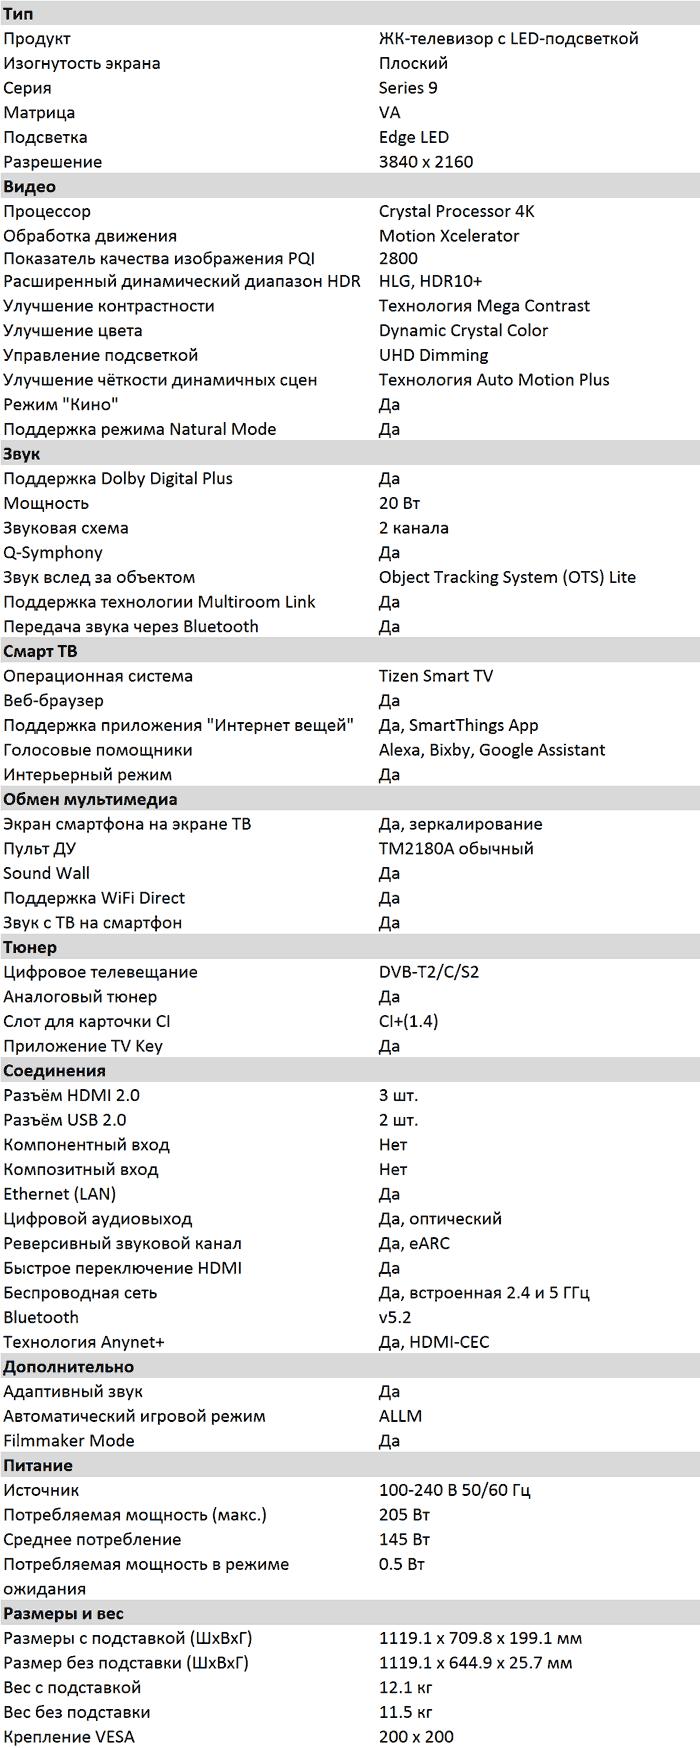 Характеристики AU9000